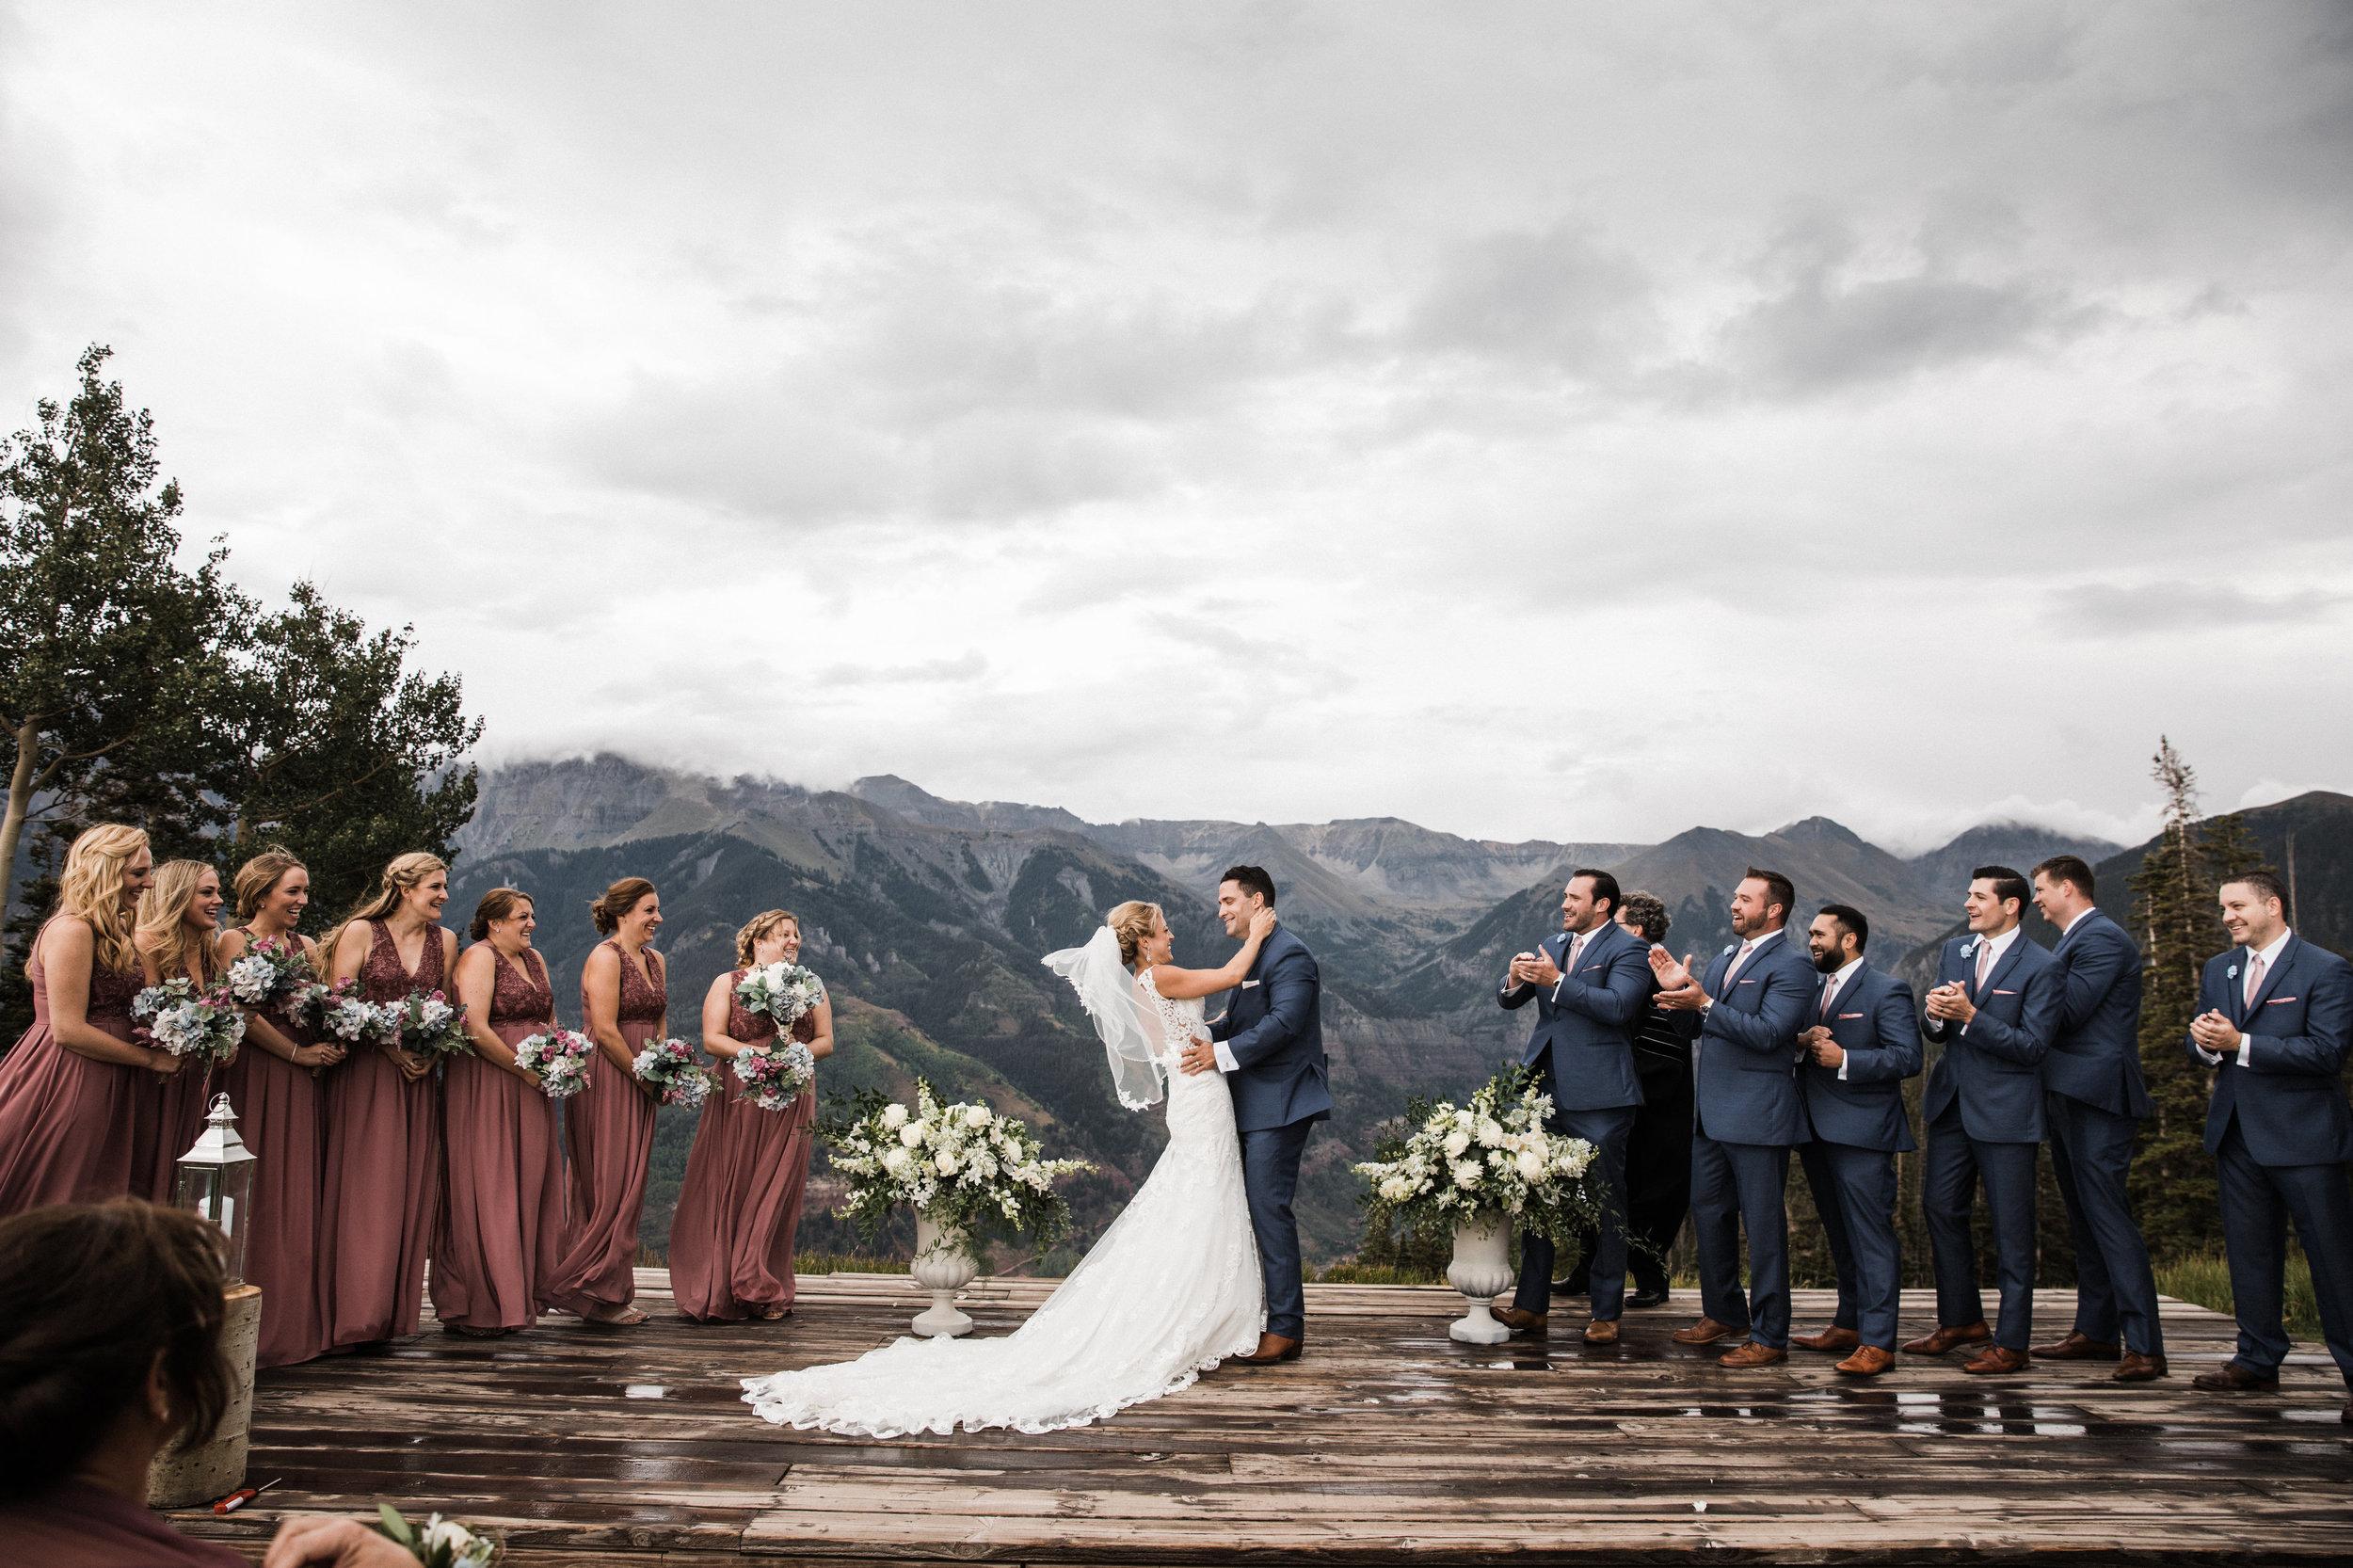 leahandashton-telluride-wedding-photography-0064.jpg